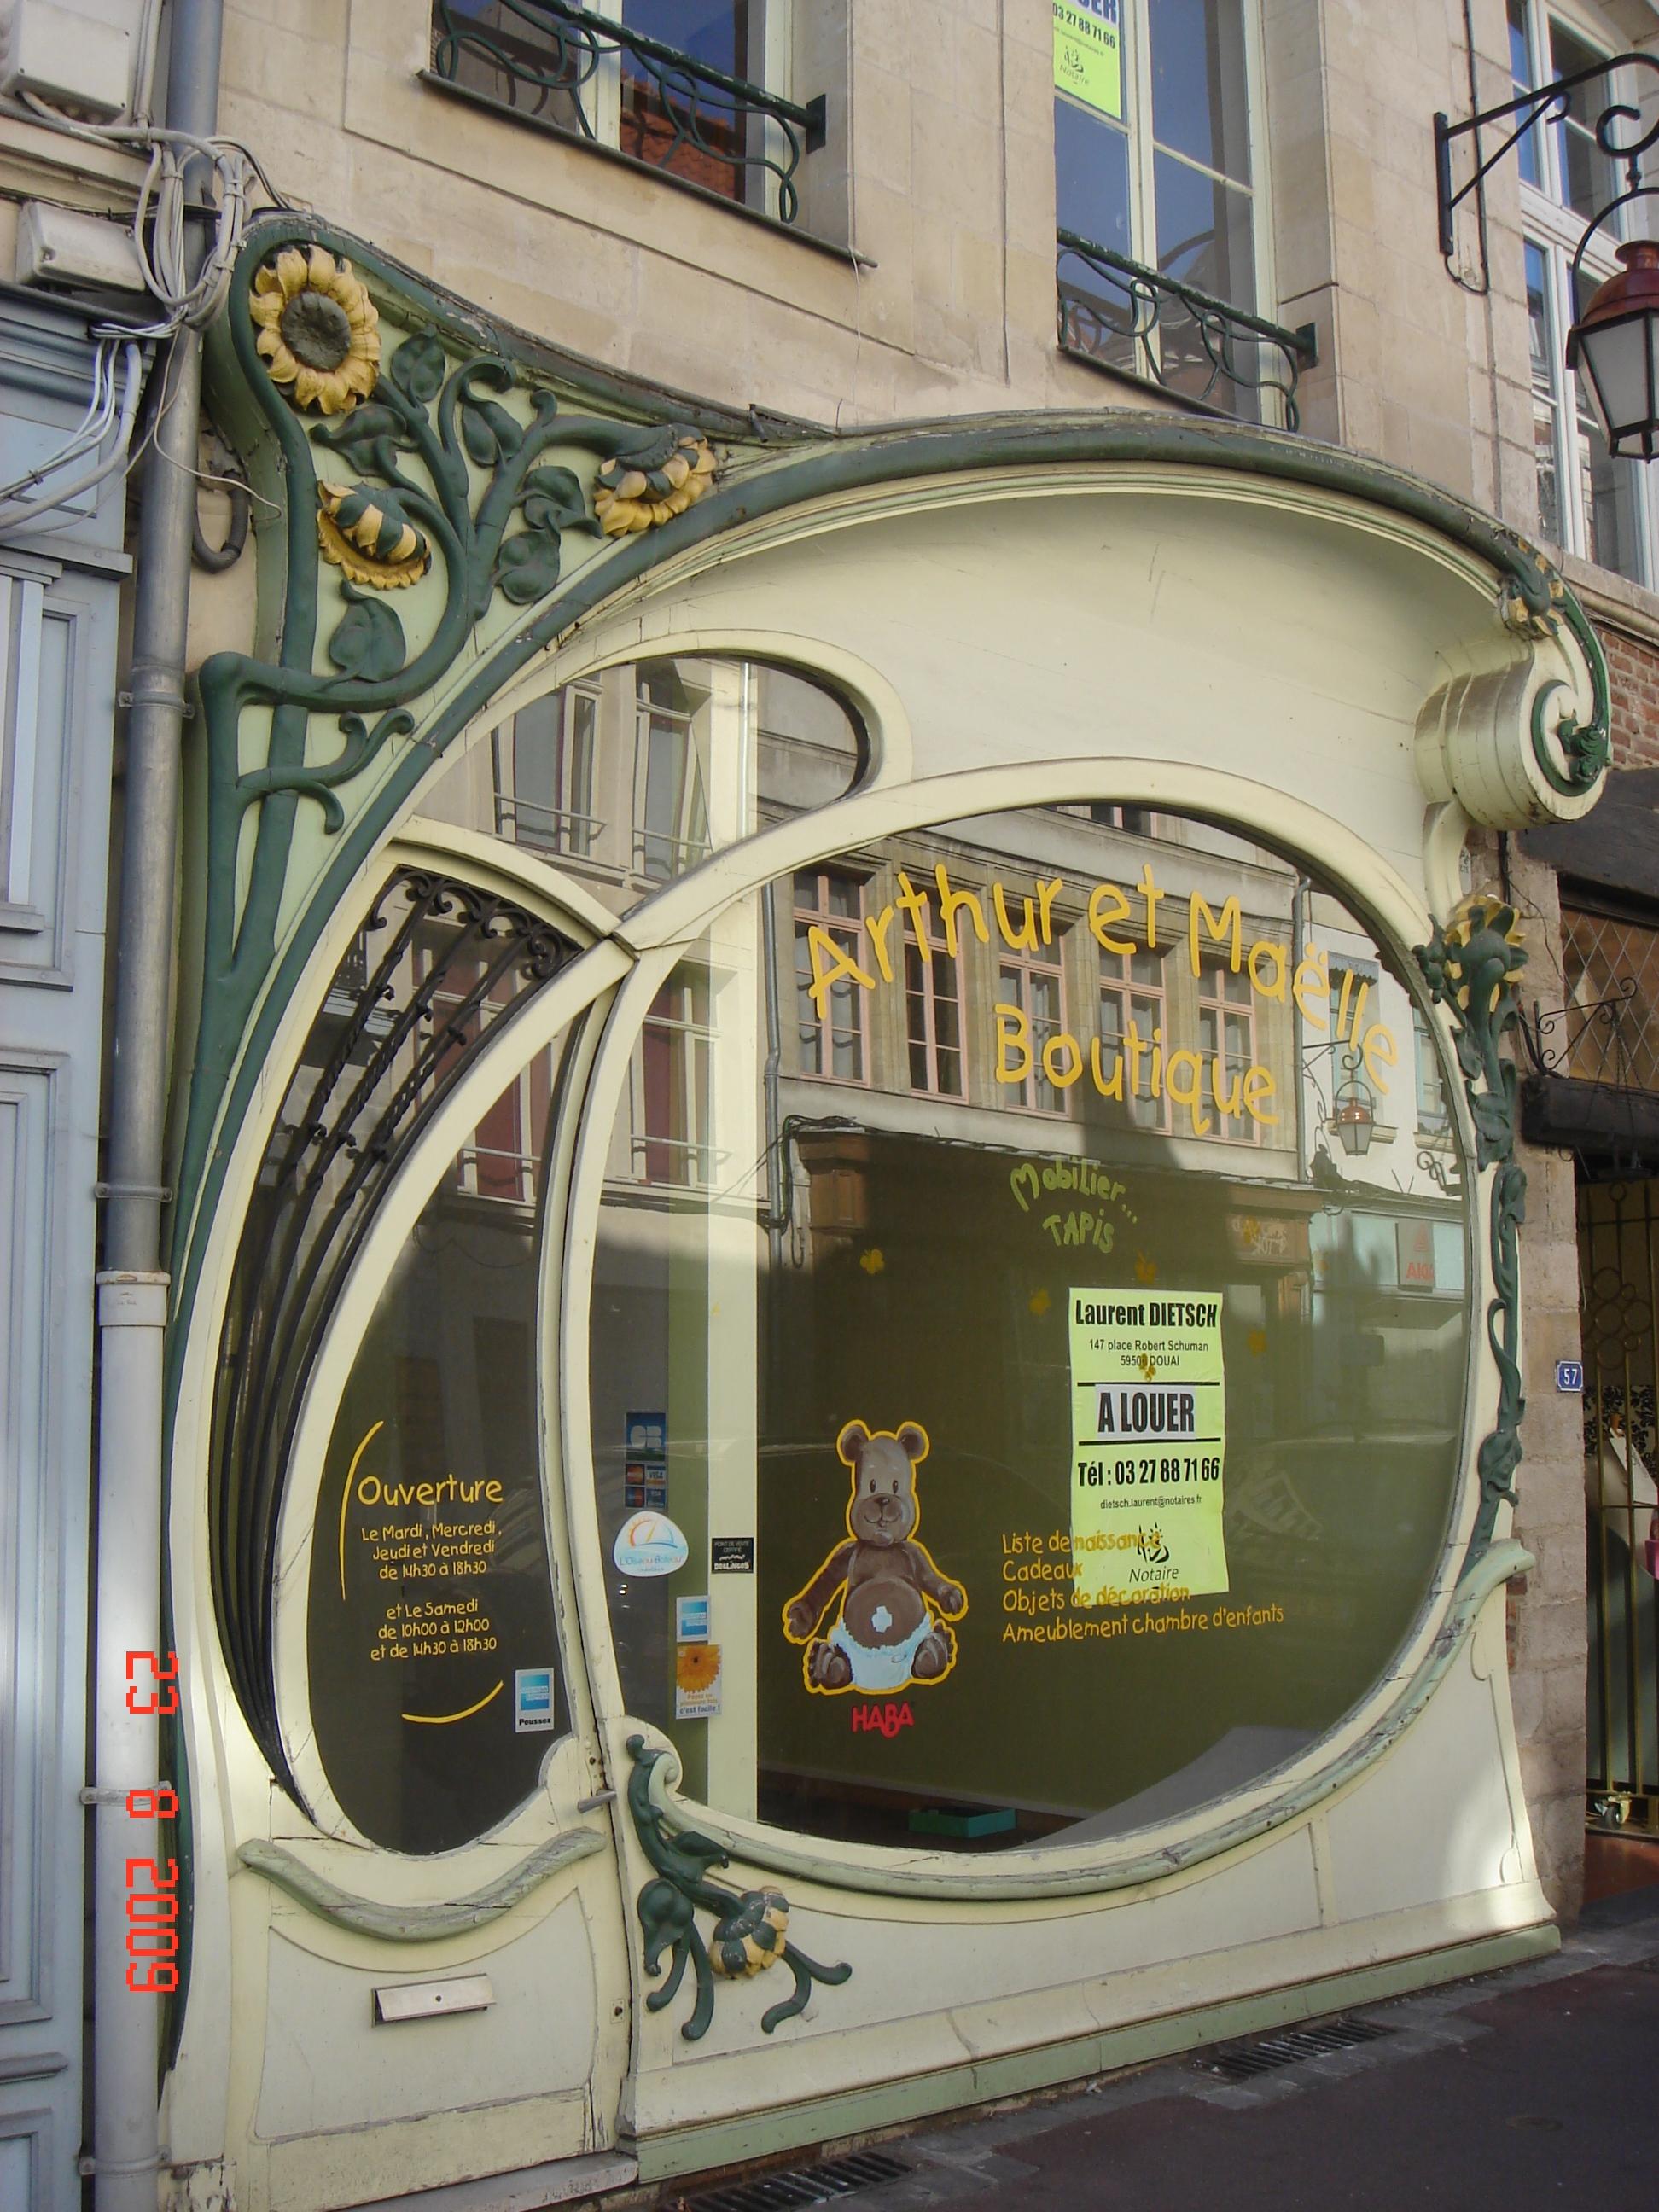 file douai rue pollinchove fa ade tournesol 1902 andr p pe wikimedia commons. Black Bedroom Furniture Sets. Home Design Ideas